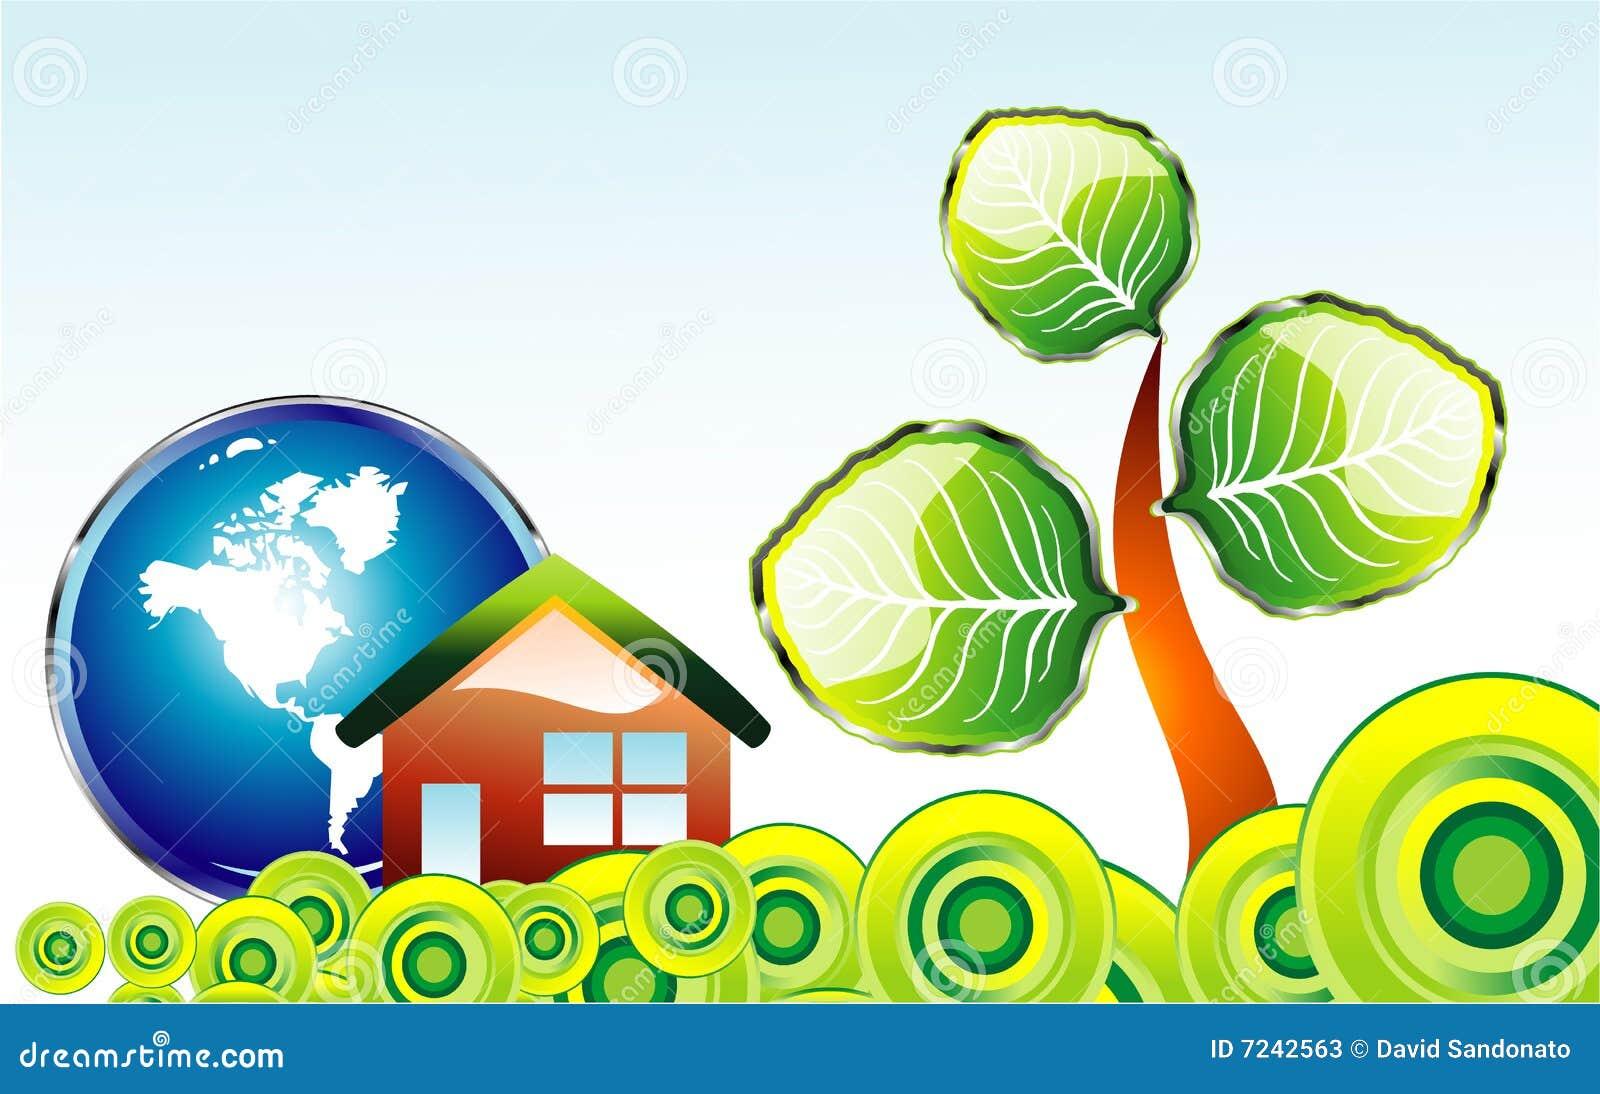 go green environment card stock vector illustration of foliage